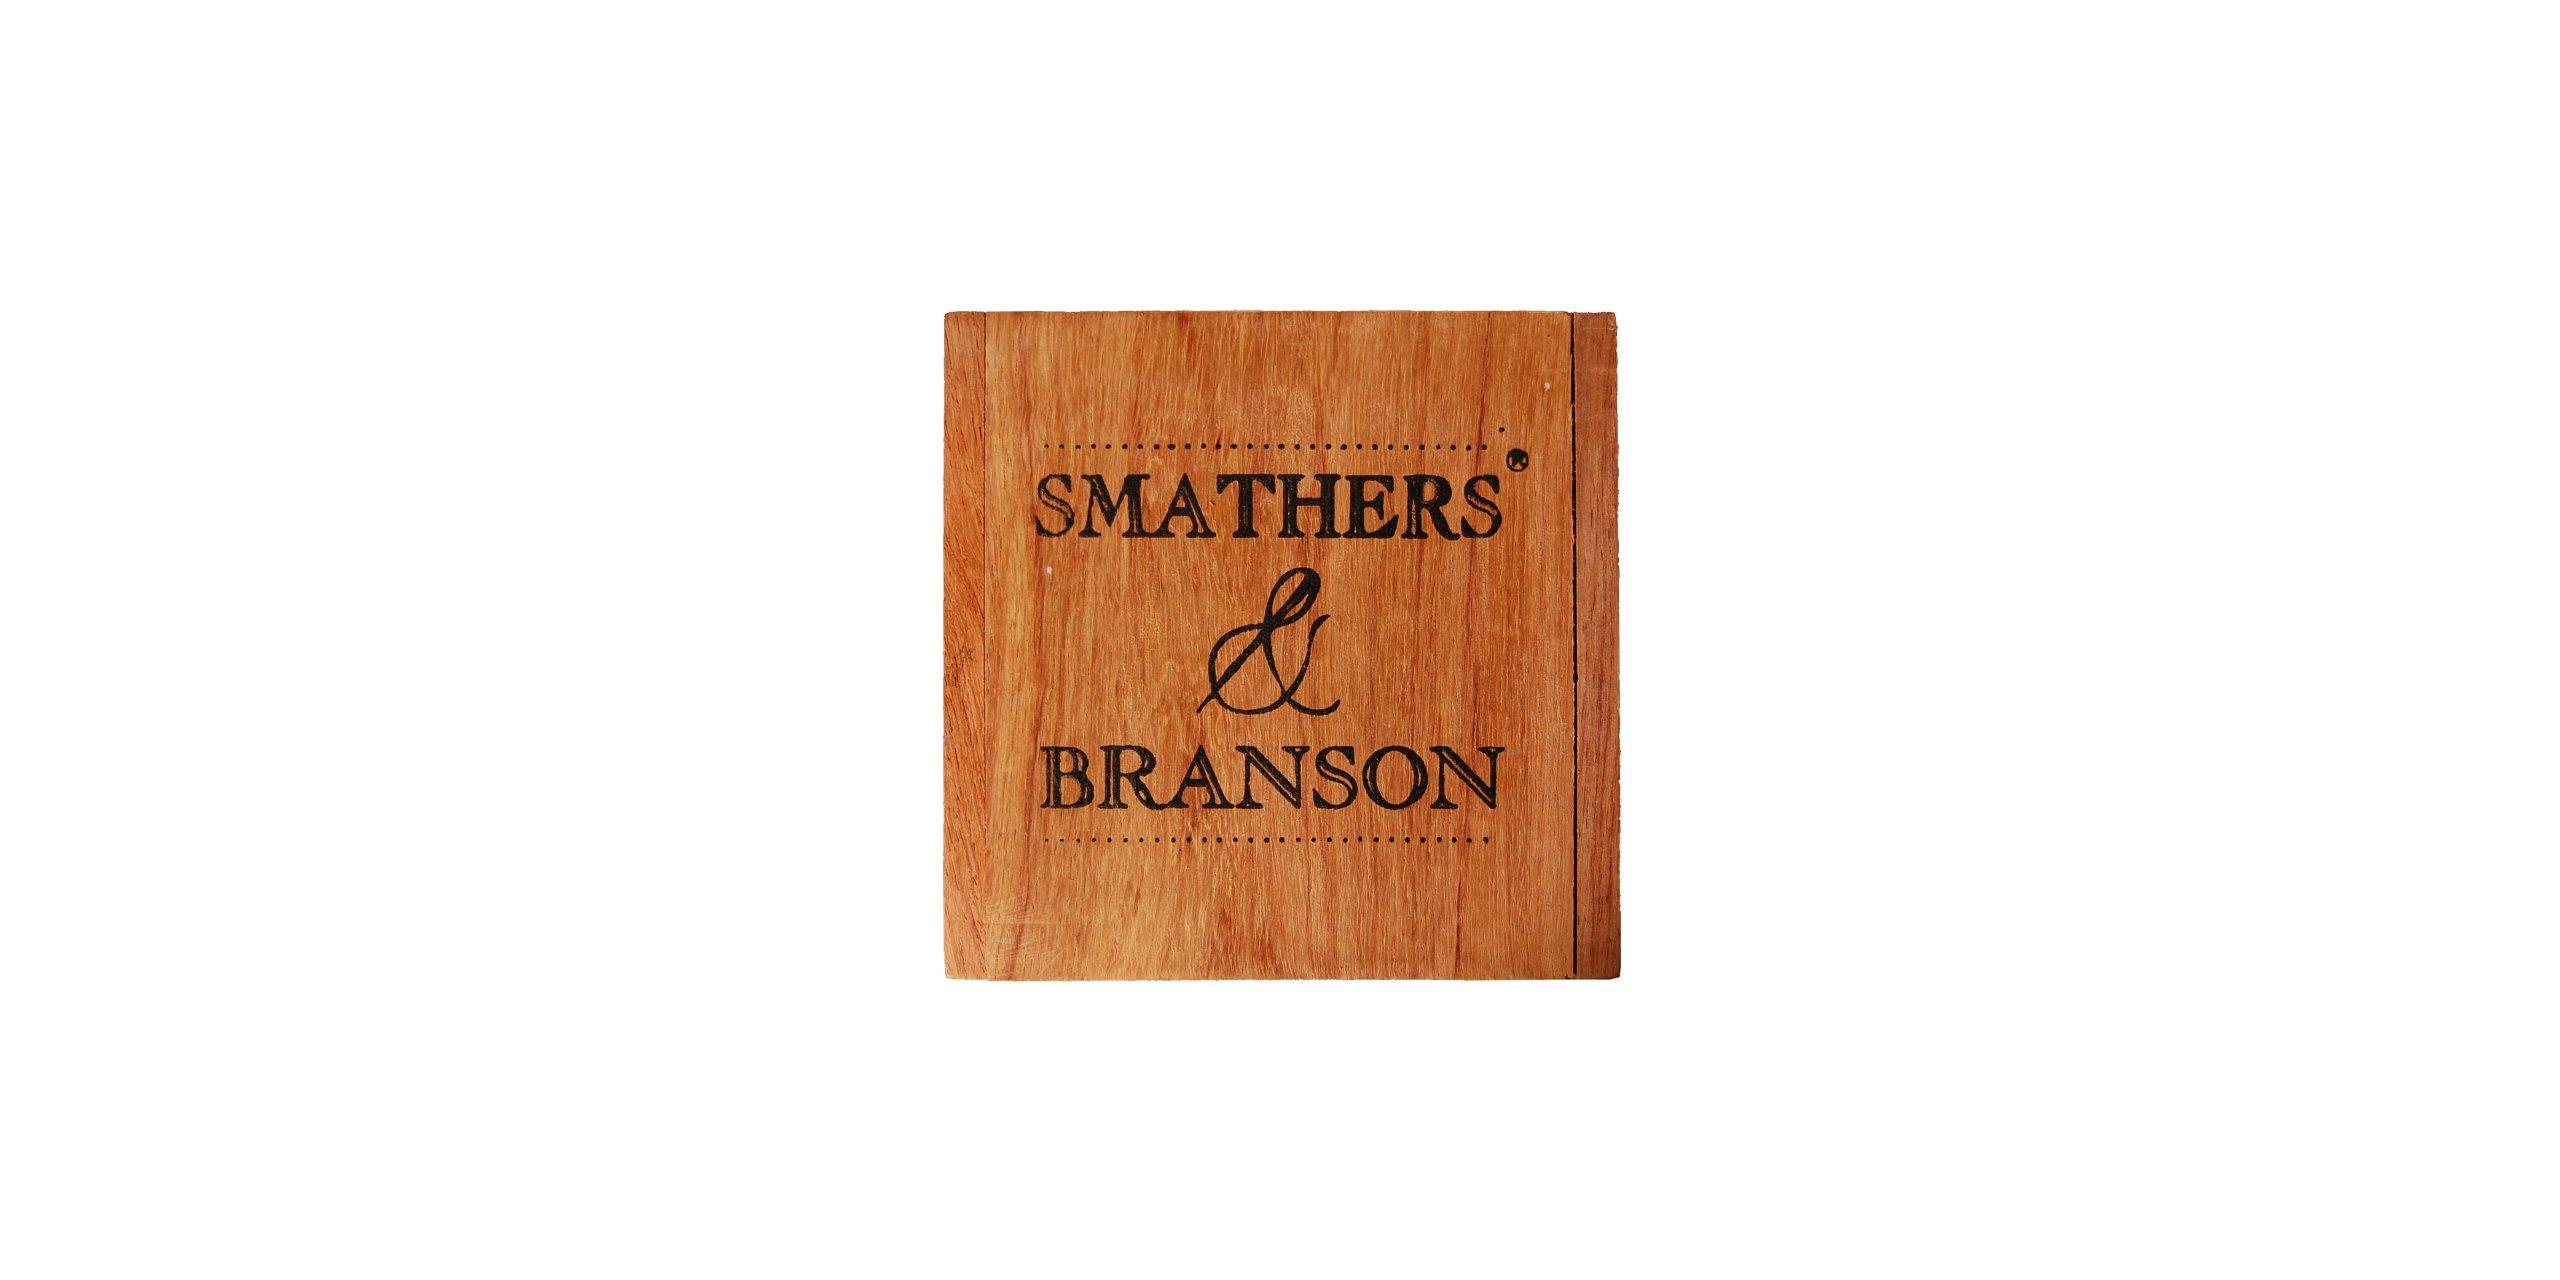 Smathers & Branson Bourbon Traditional Needlepoint Belt, Size 34 (B-159-34) by Smathers & Branson (Image #2)